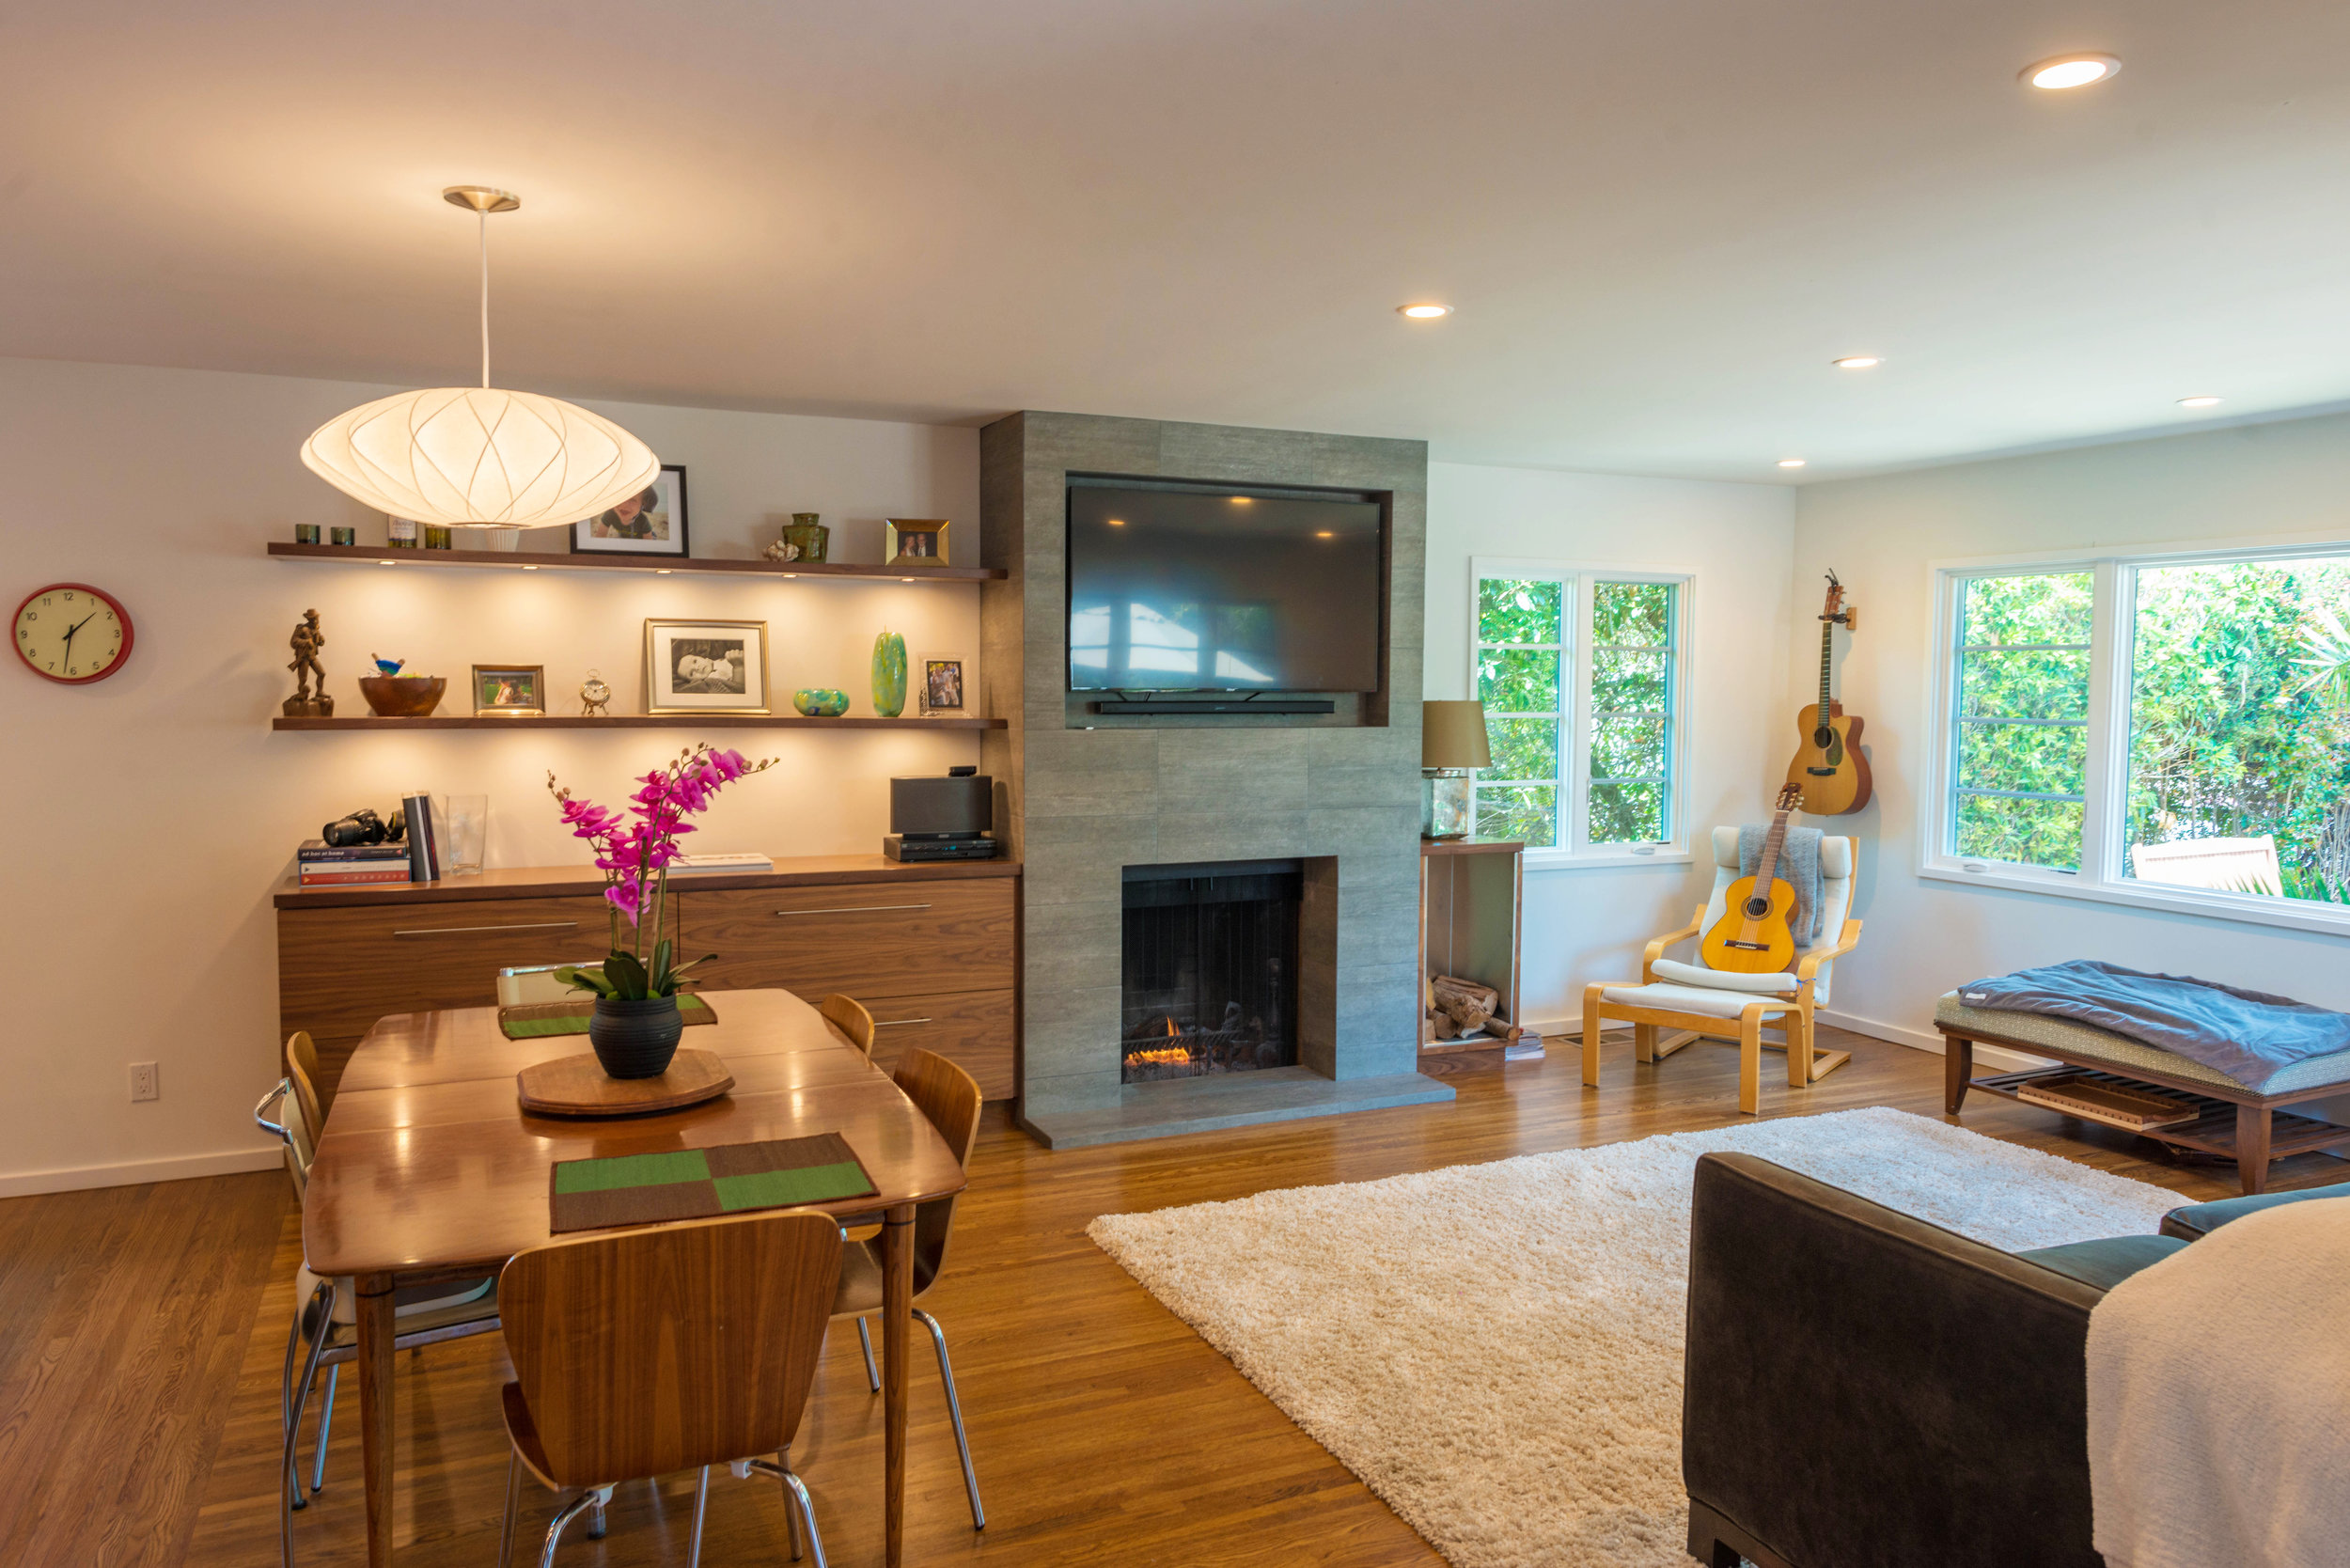 Santa Barbara home design by the CDB Group